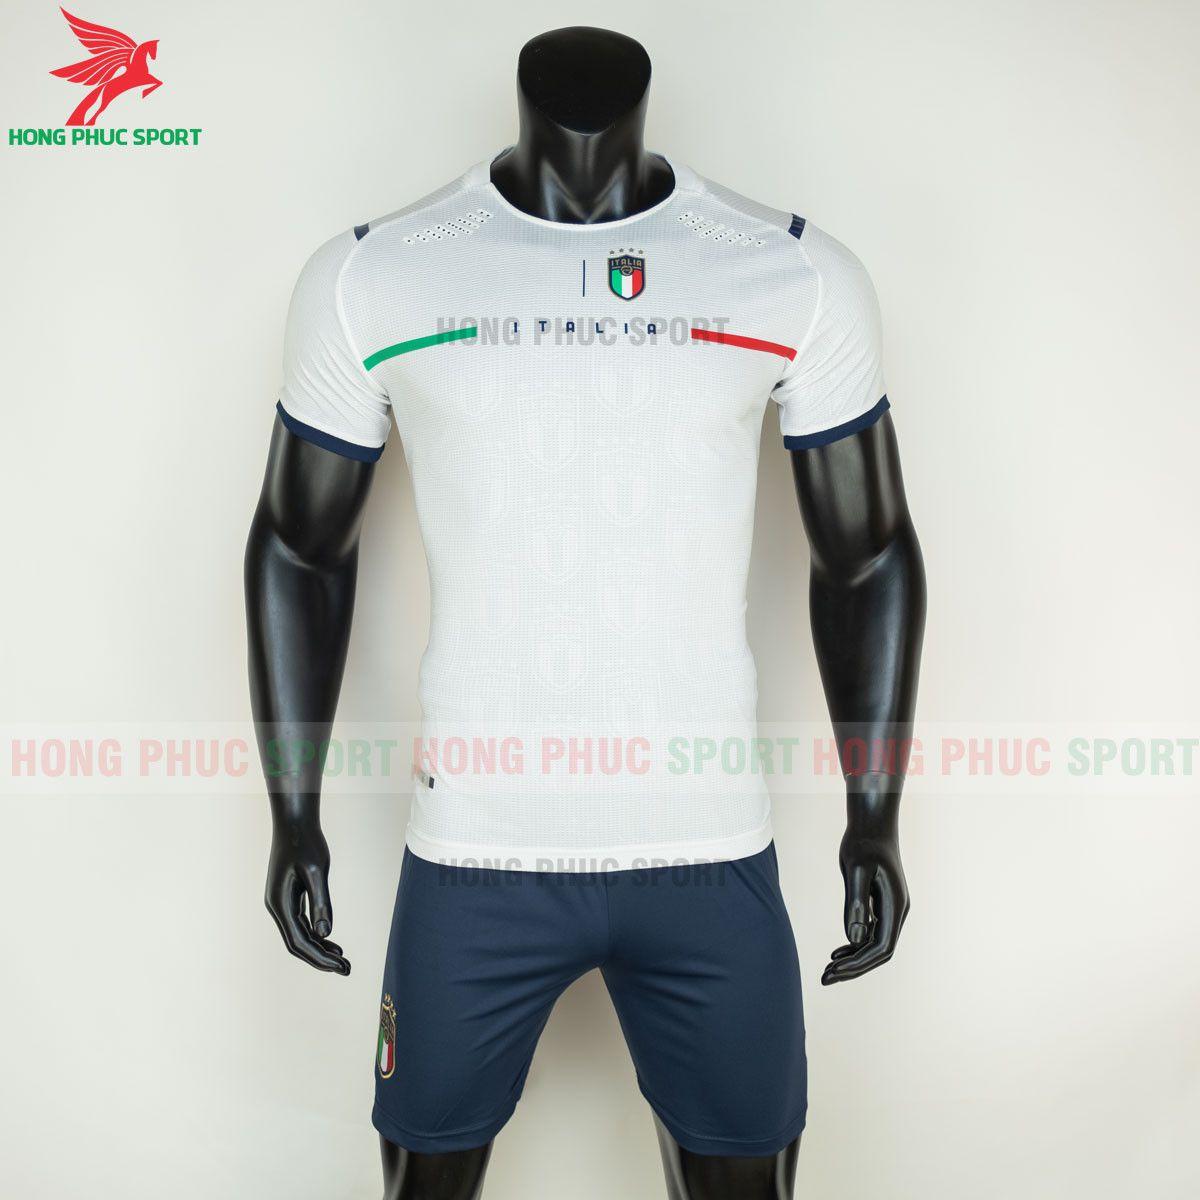 https://cdn.hongphucsport.com/unsafe/s4.shopbay.vn/files/285/ao-bong-da-tuyen-italia-2021-san-khach-hang-thai-2-60d2fefa7a131.jpg